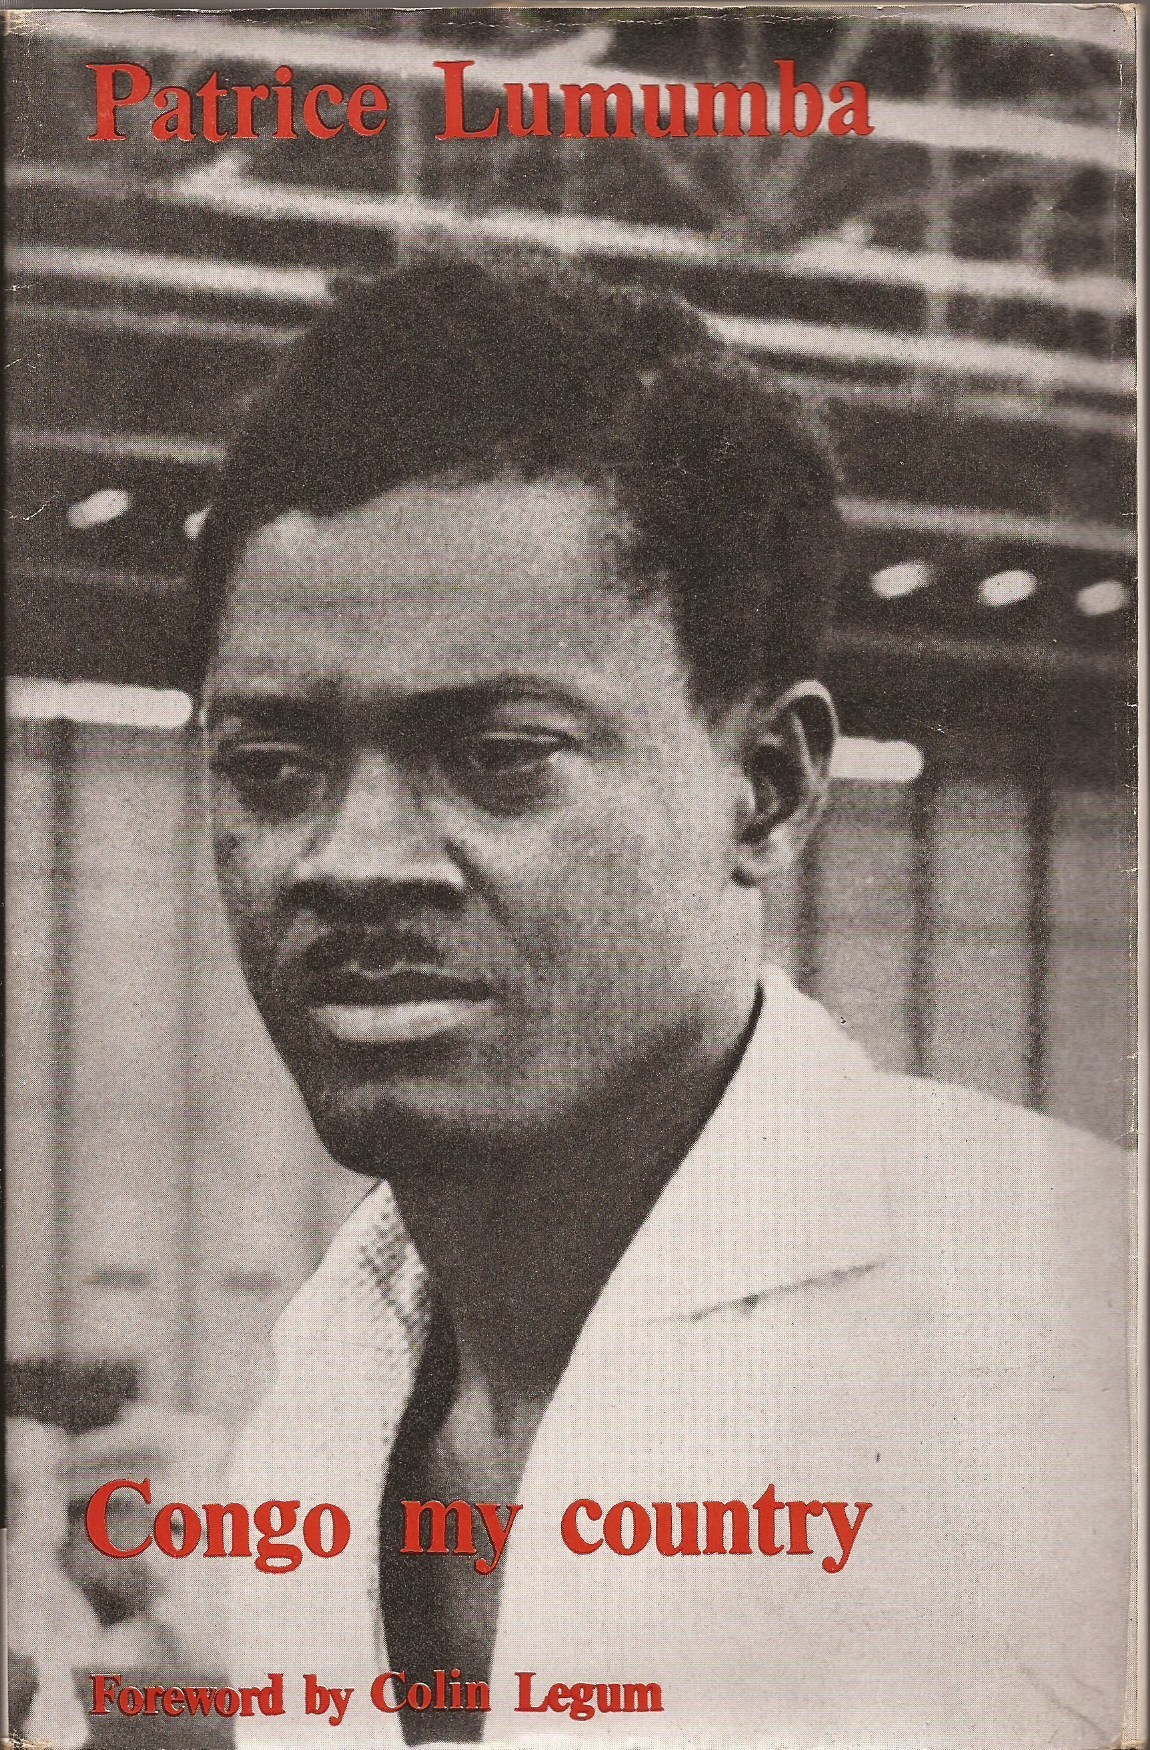 Congo, My Country Patrice Lumumba